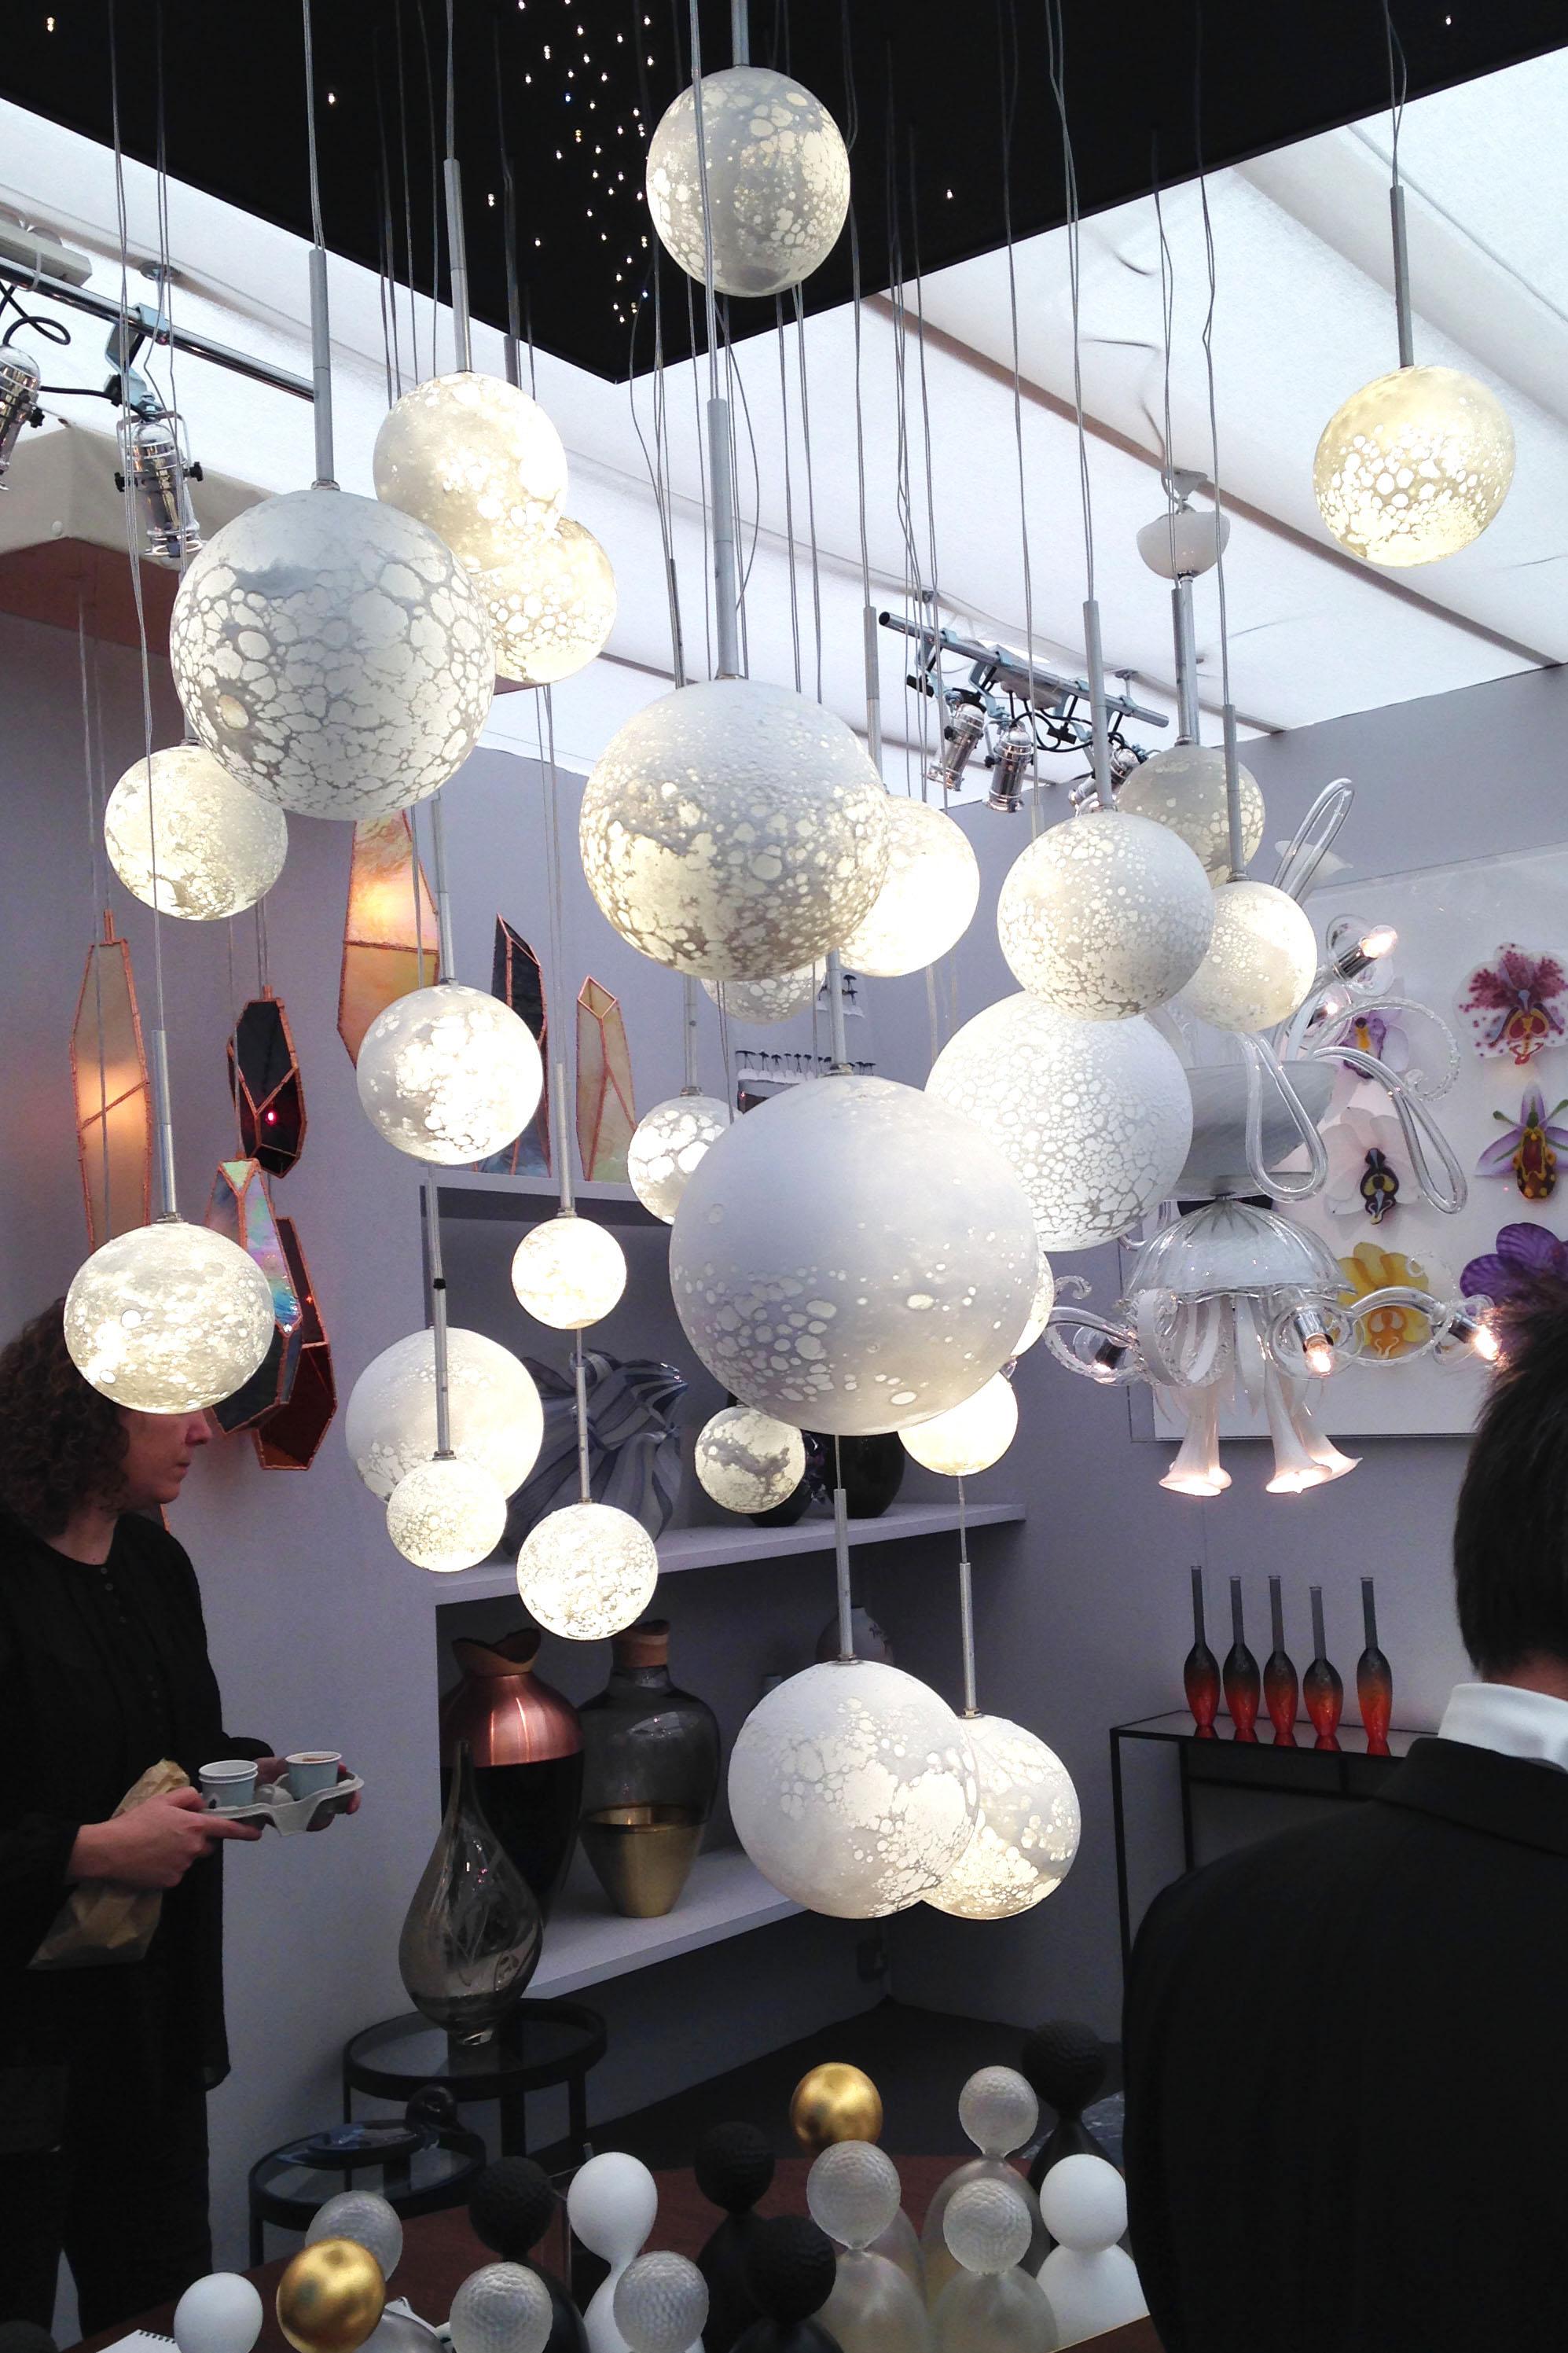 Lighting at decorex 2014 illumina lighting vessel gallery at decorex 2014 mozeypictures Choice Image